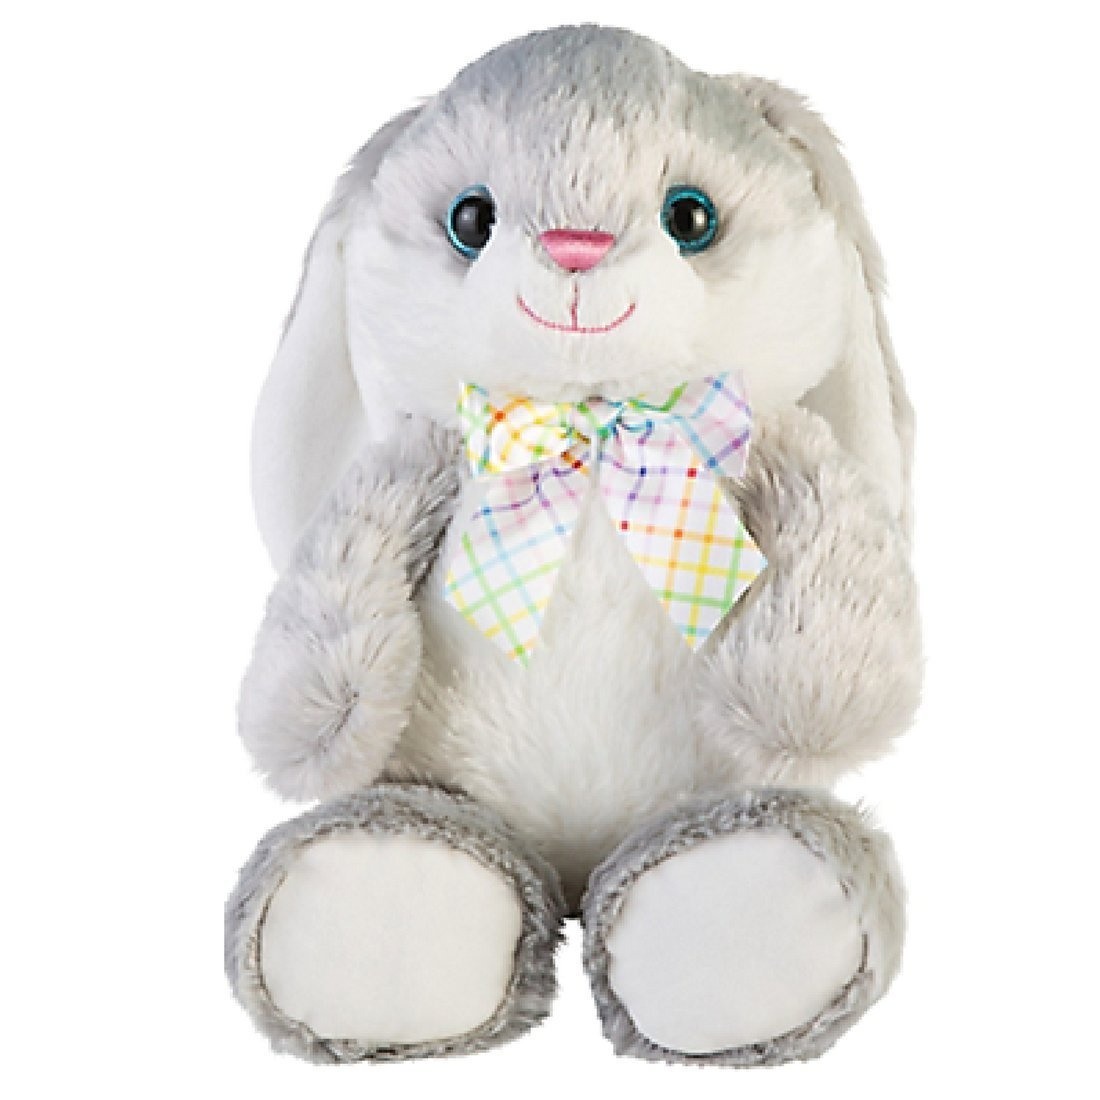 Easter plush bunny stuffed rabbit animal soft grey large 46cm boys easter plush bunny stuffed rabbit animal soft grey large 46cm boys girls toddlers children gift by hugfun shop online for toys in australia negle Choice Image